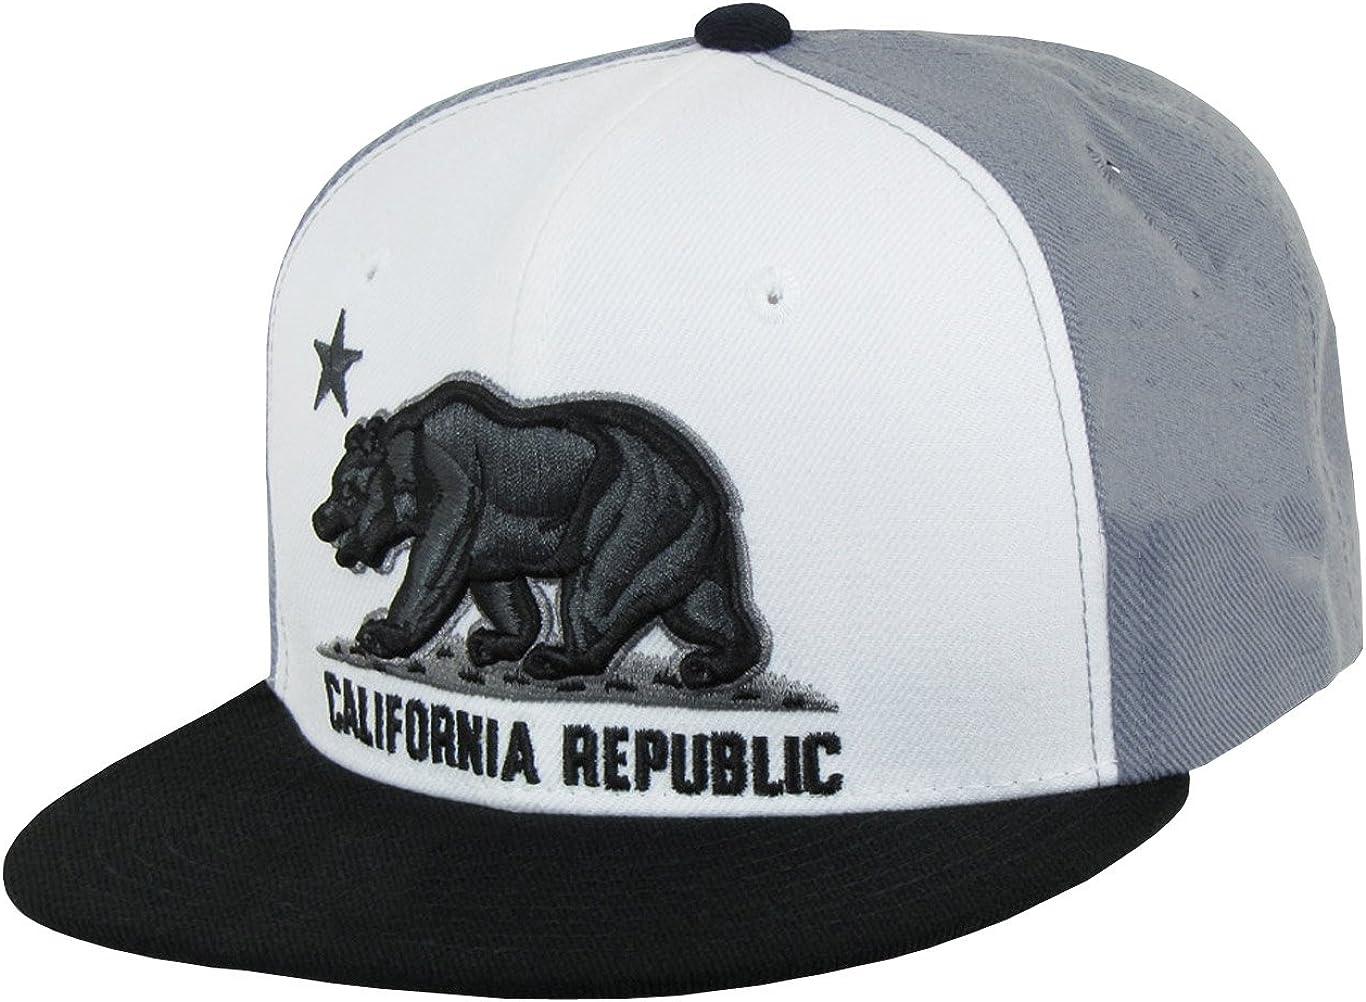 WHANG California Republic Snapbacks